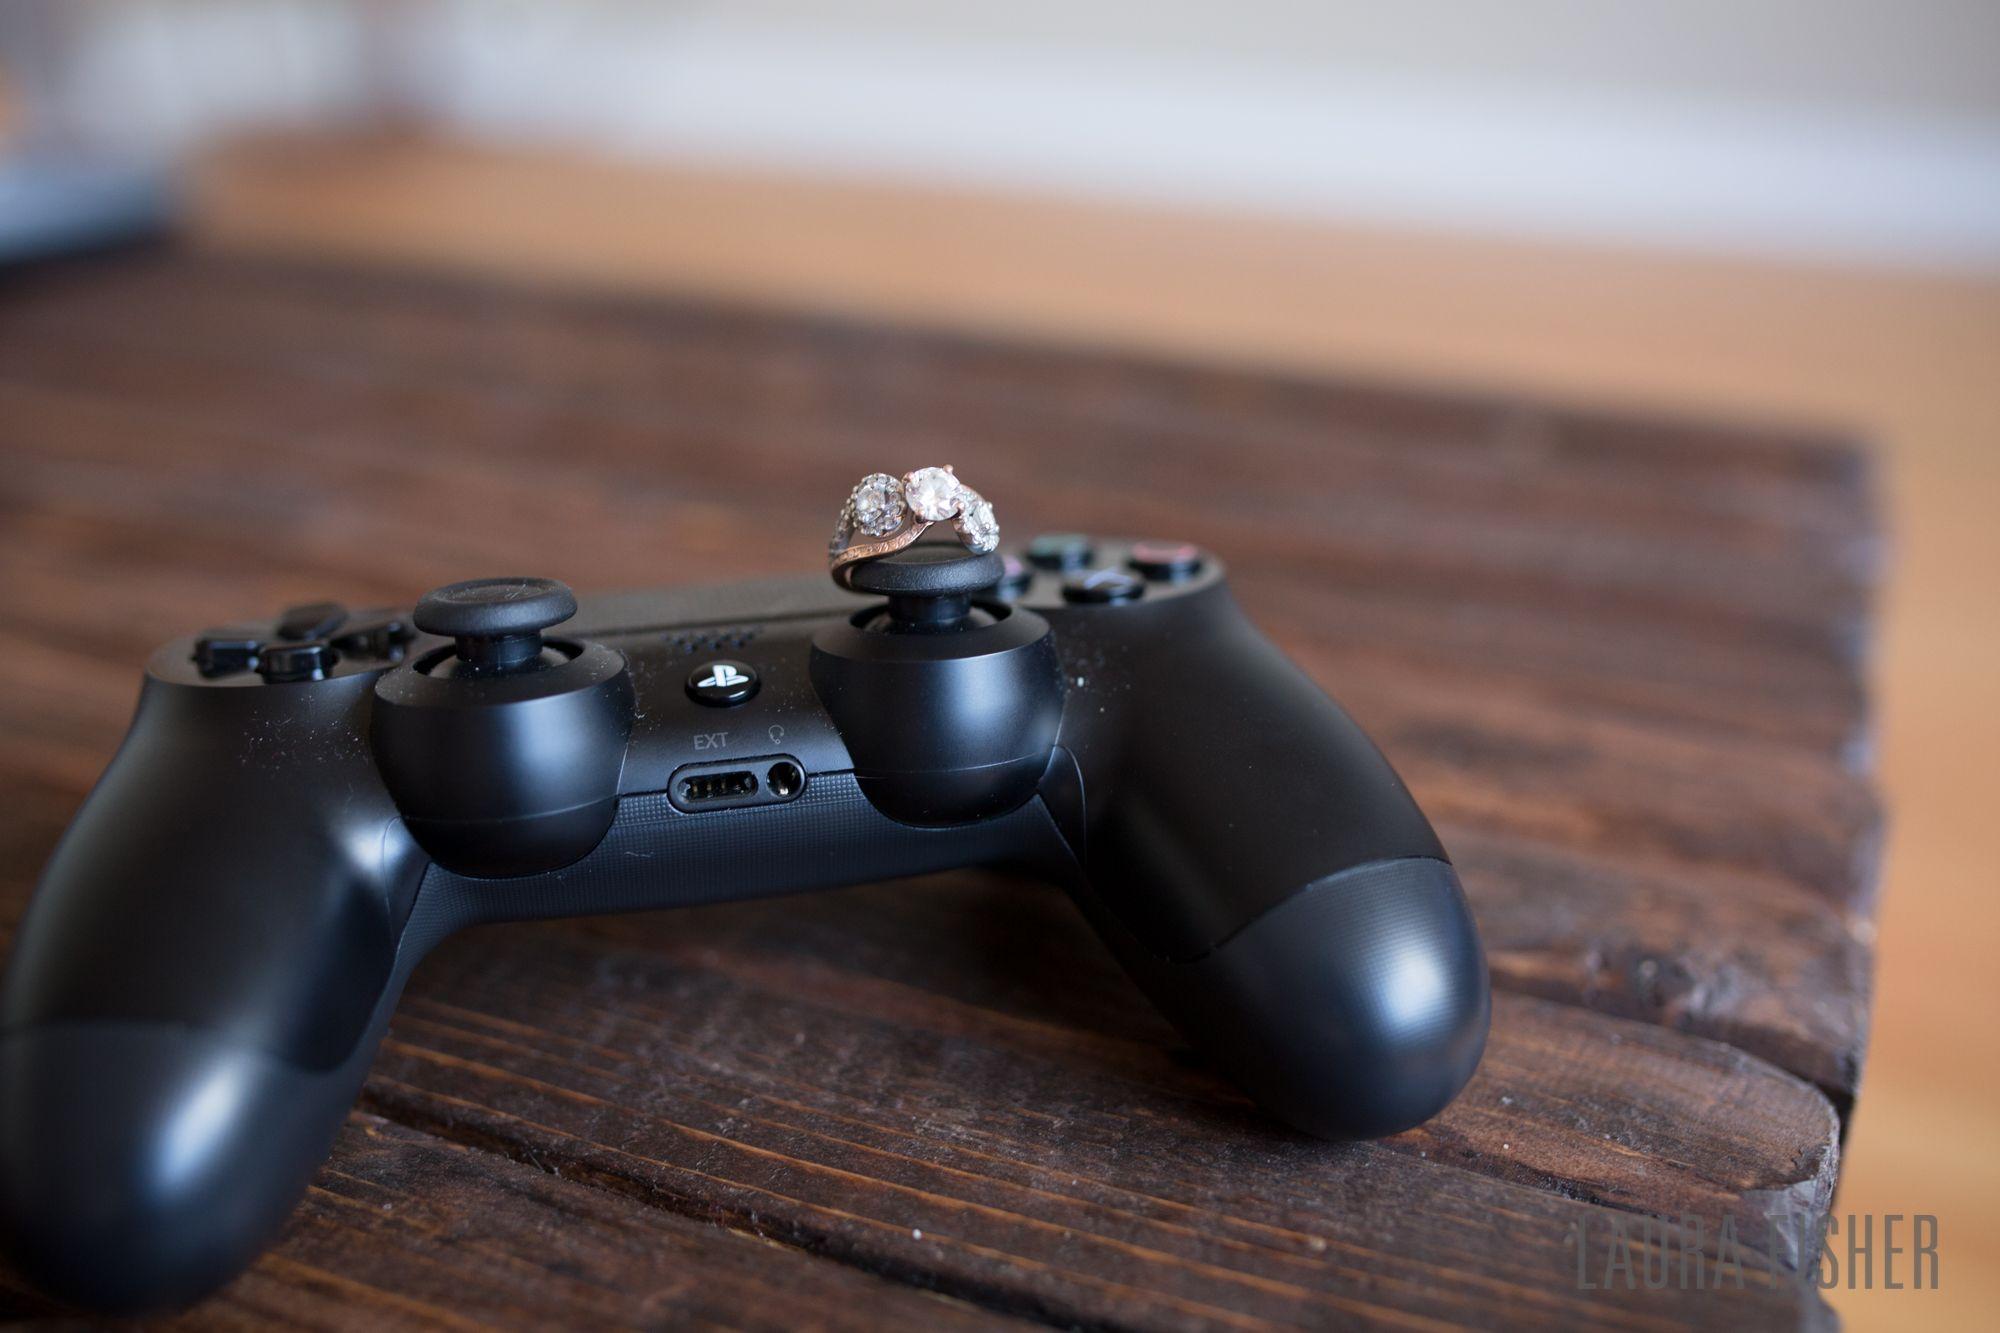 PS4 Engagement Ring Wedding Pics Nerd Engagement